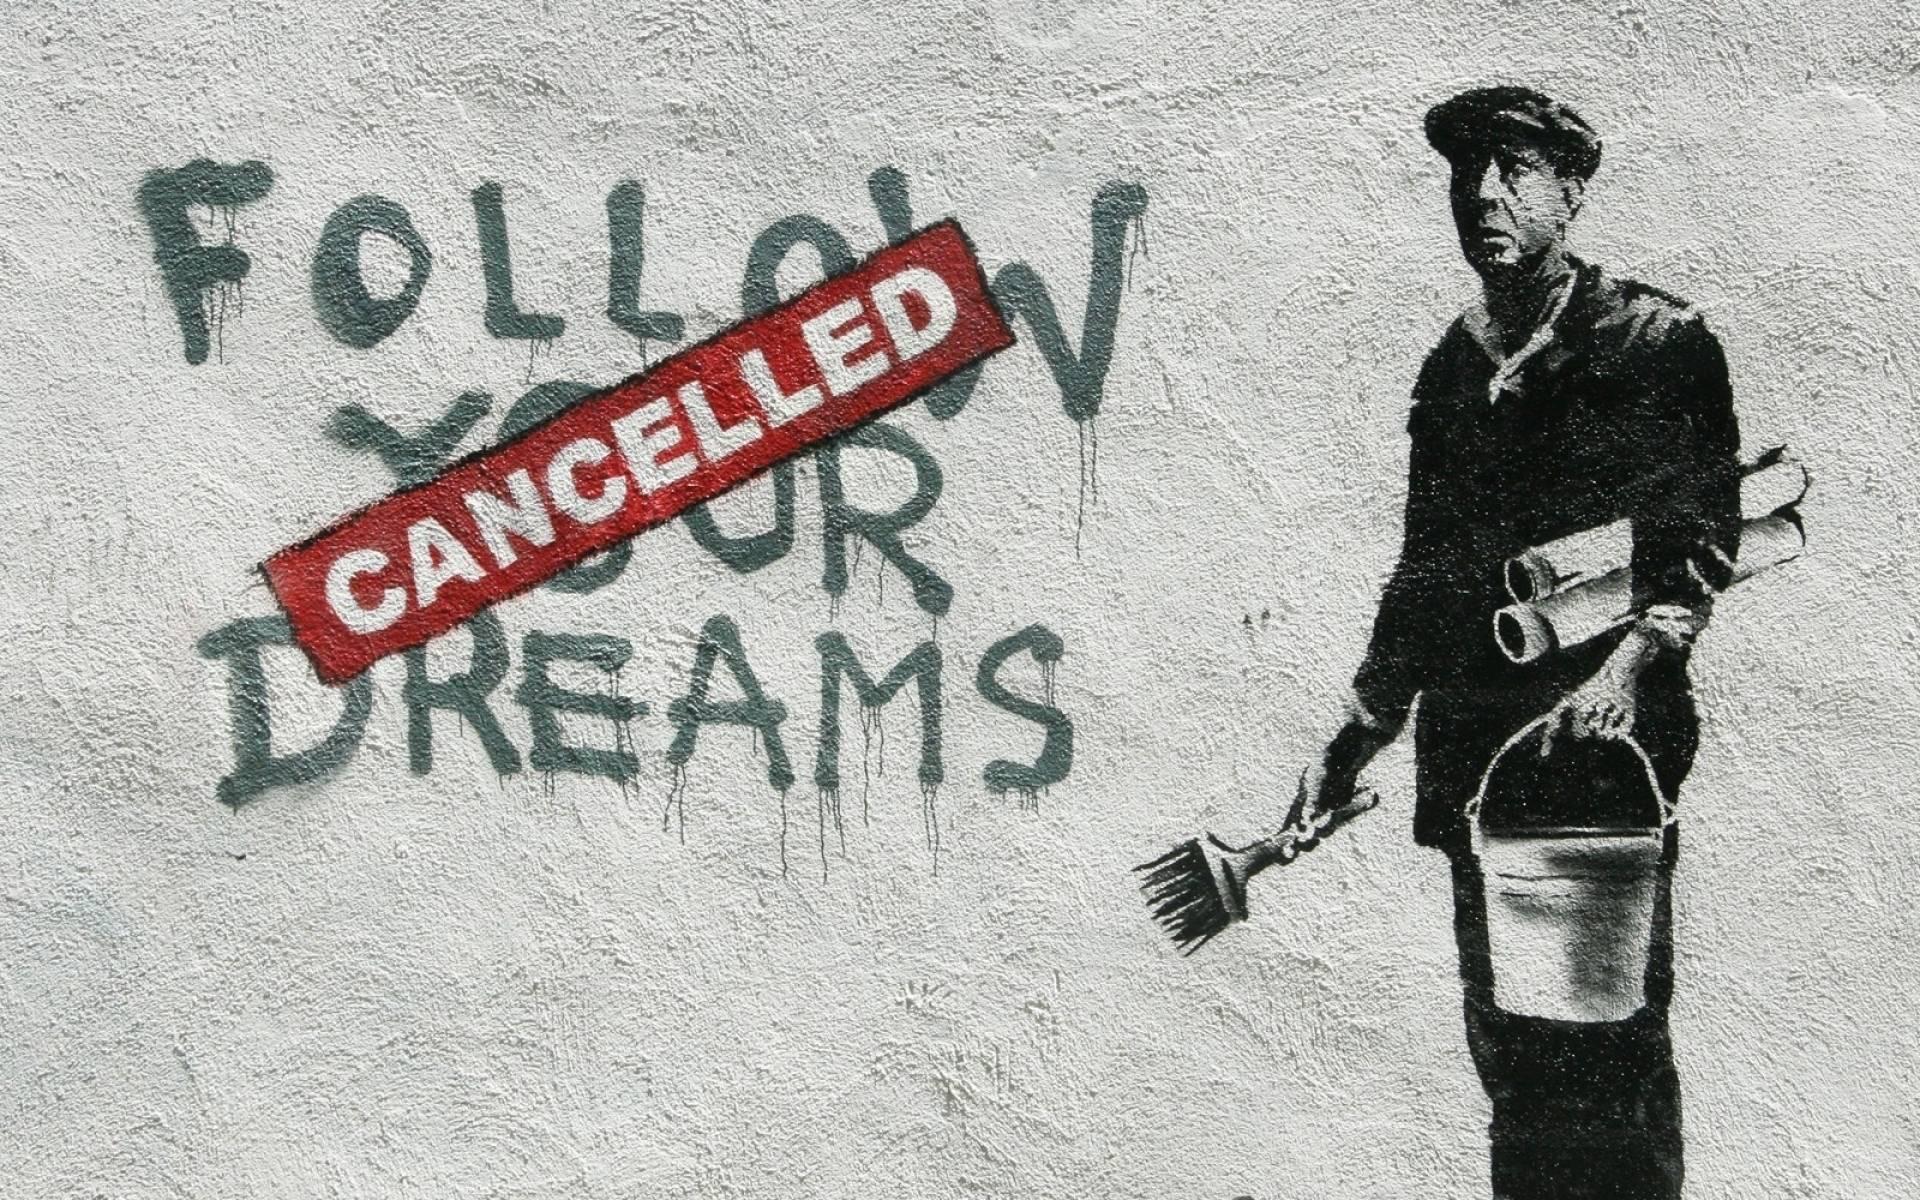 Banksy Wallpapers Wallpaper Cave